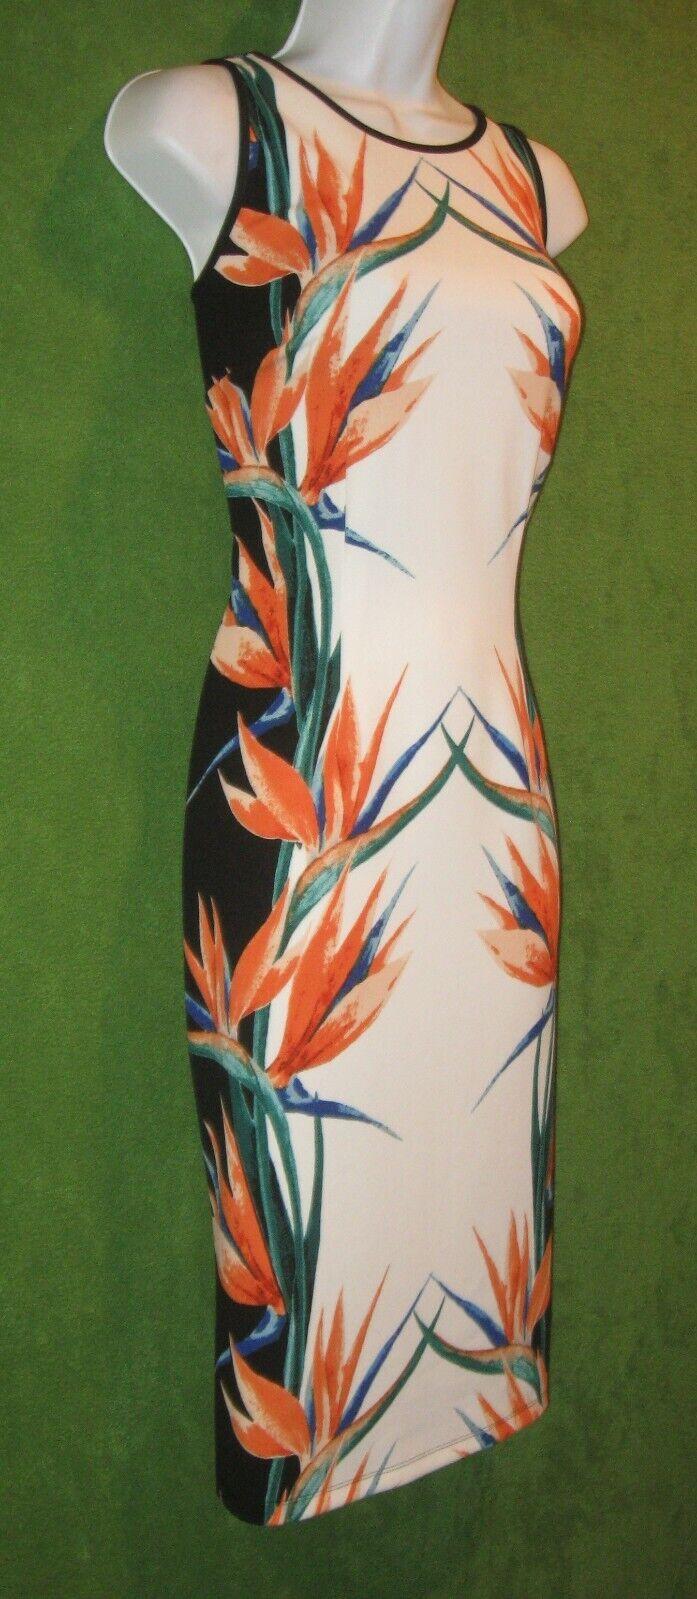 Enfocus Studio Multi-Farbe Bird Paradise Floral Stretch Dress 8  MISC